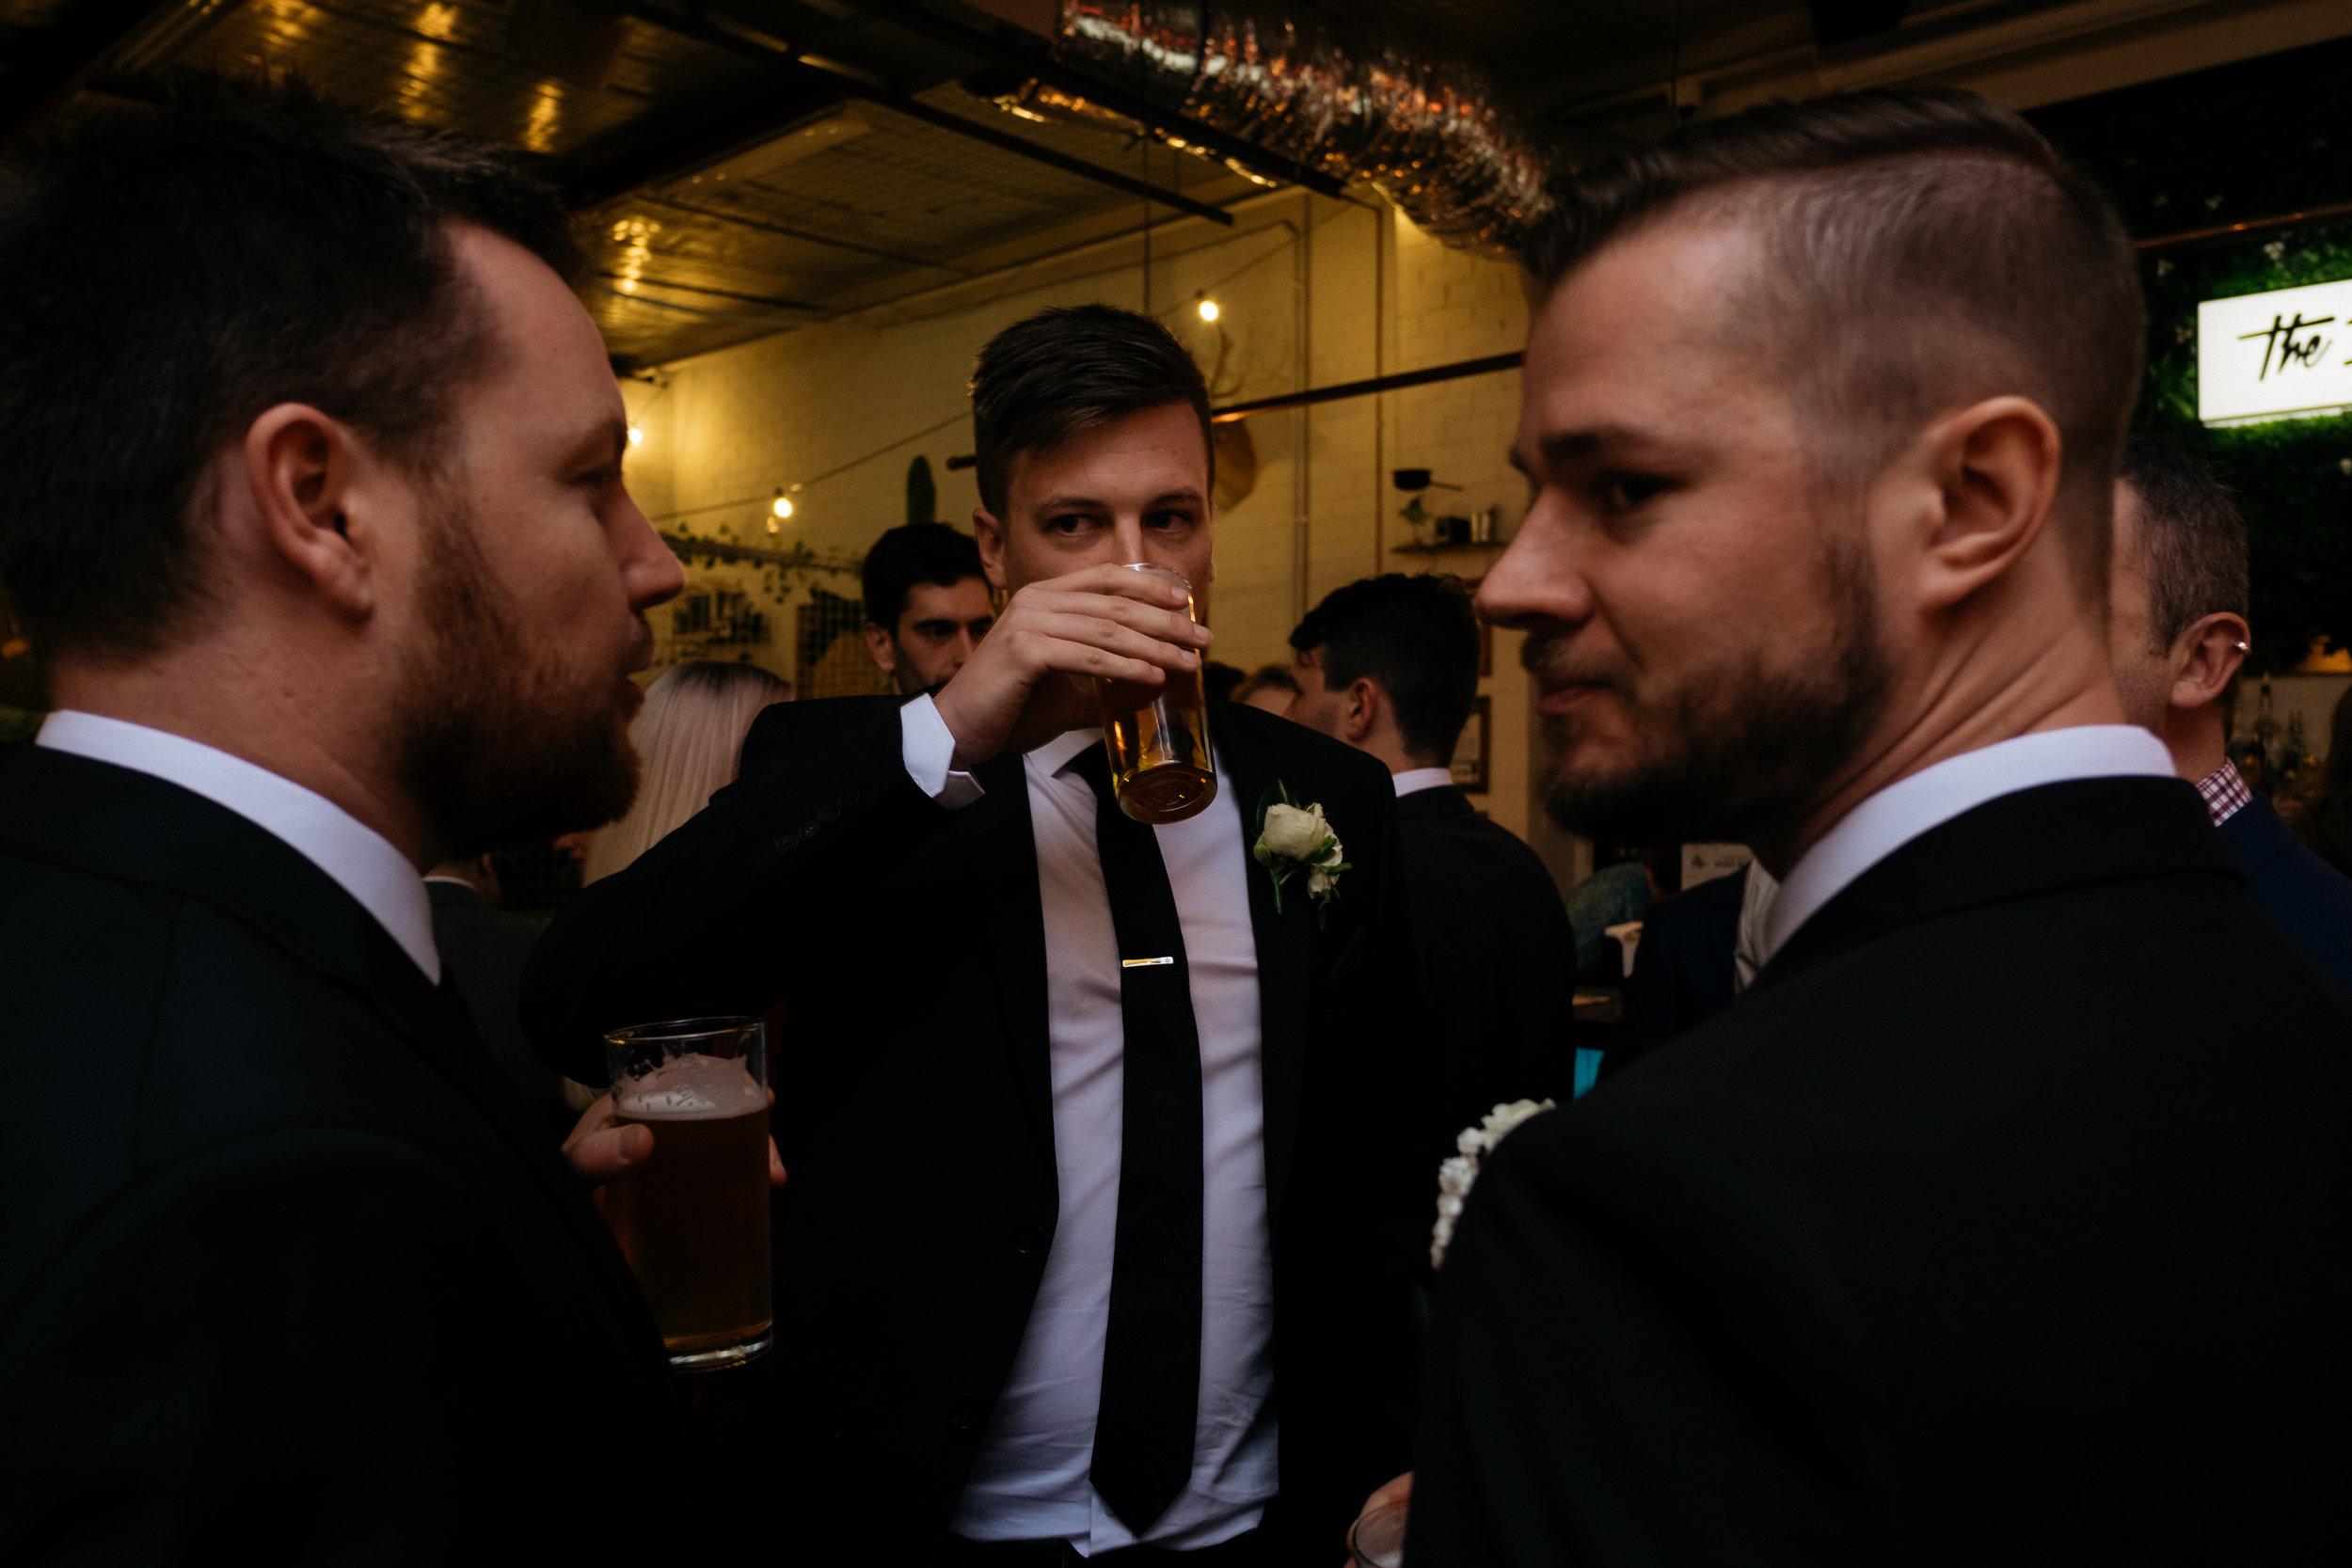 Groom drinking a pint of beer